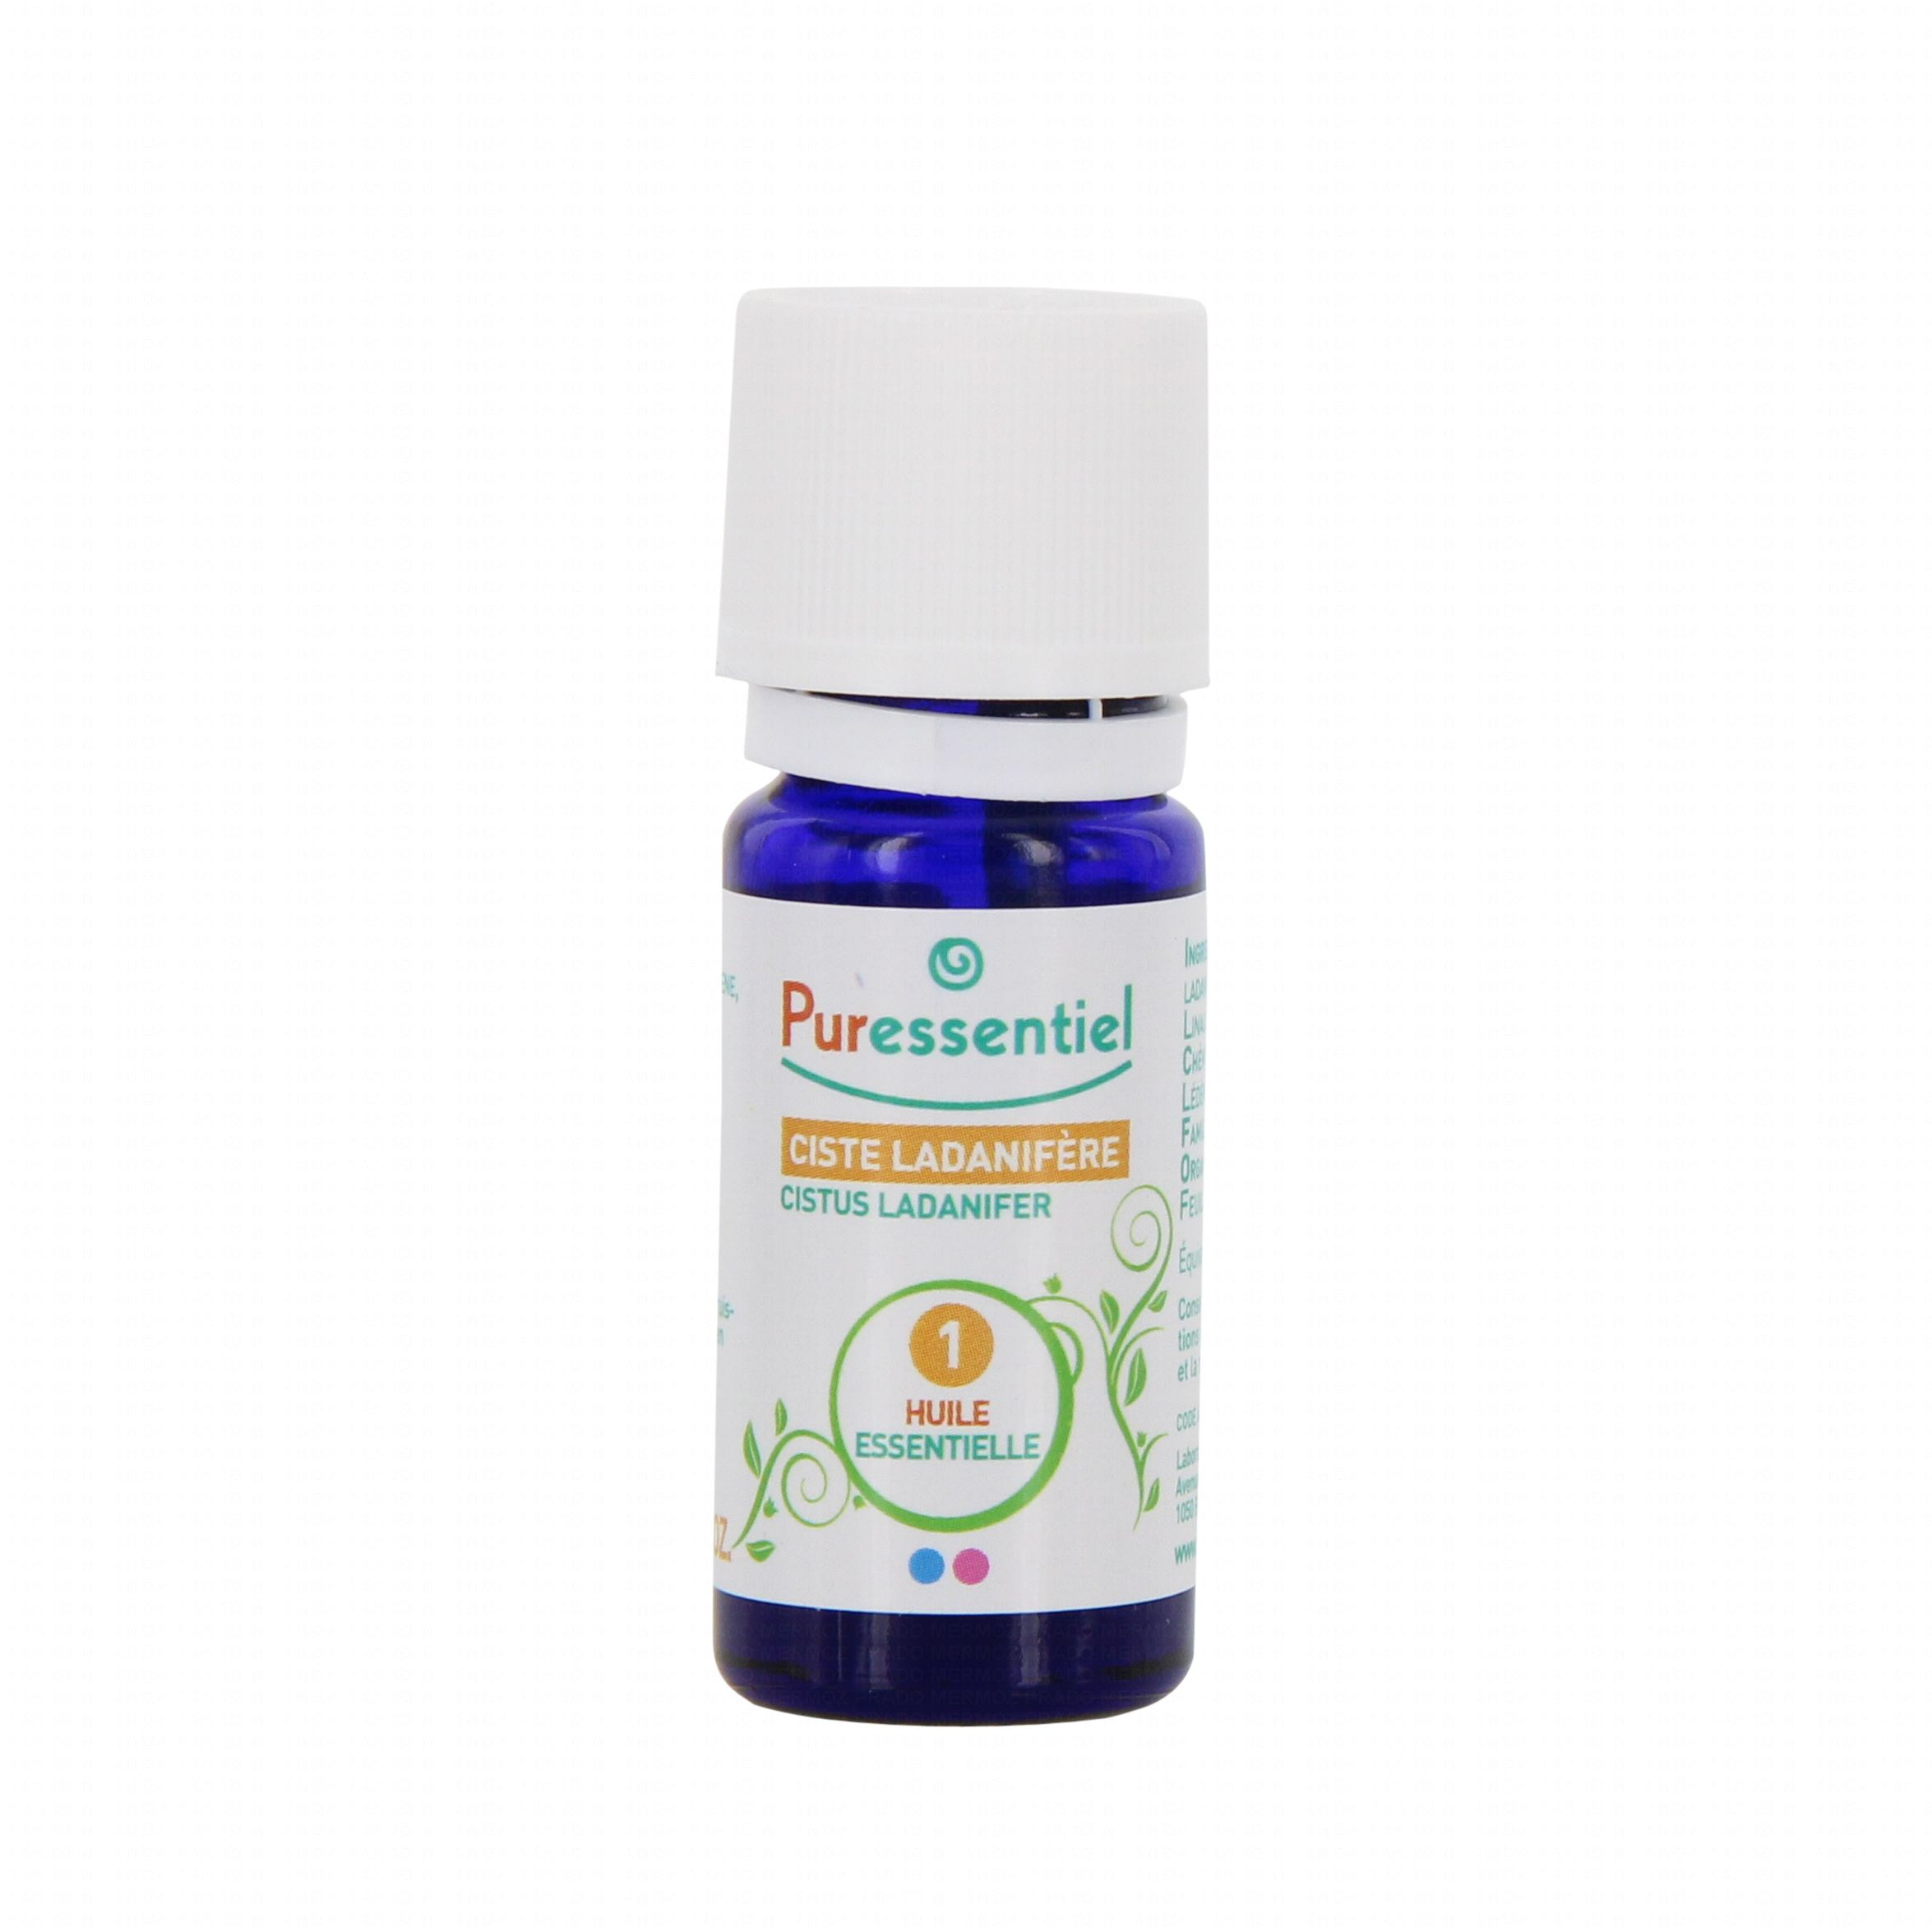 puressentiel-huile-essentielle-ciste-ladanif-re-flacon-5-ml-15083_101_1383046058